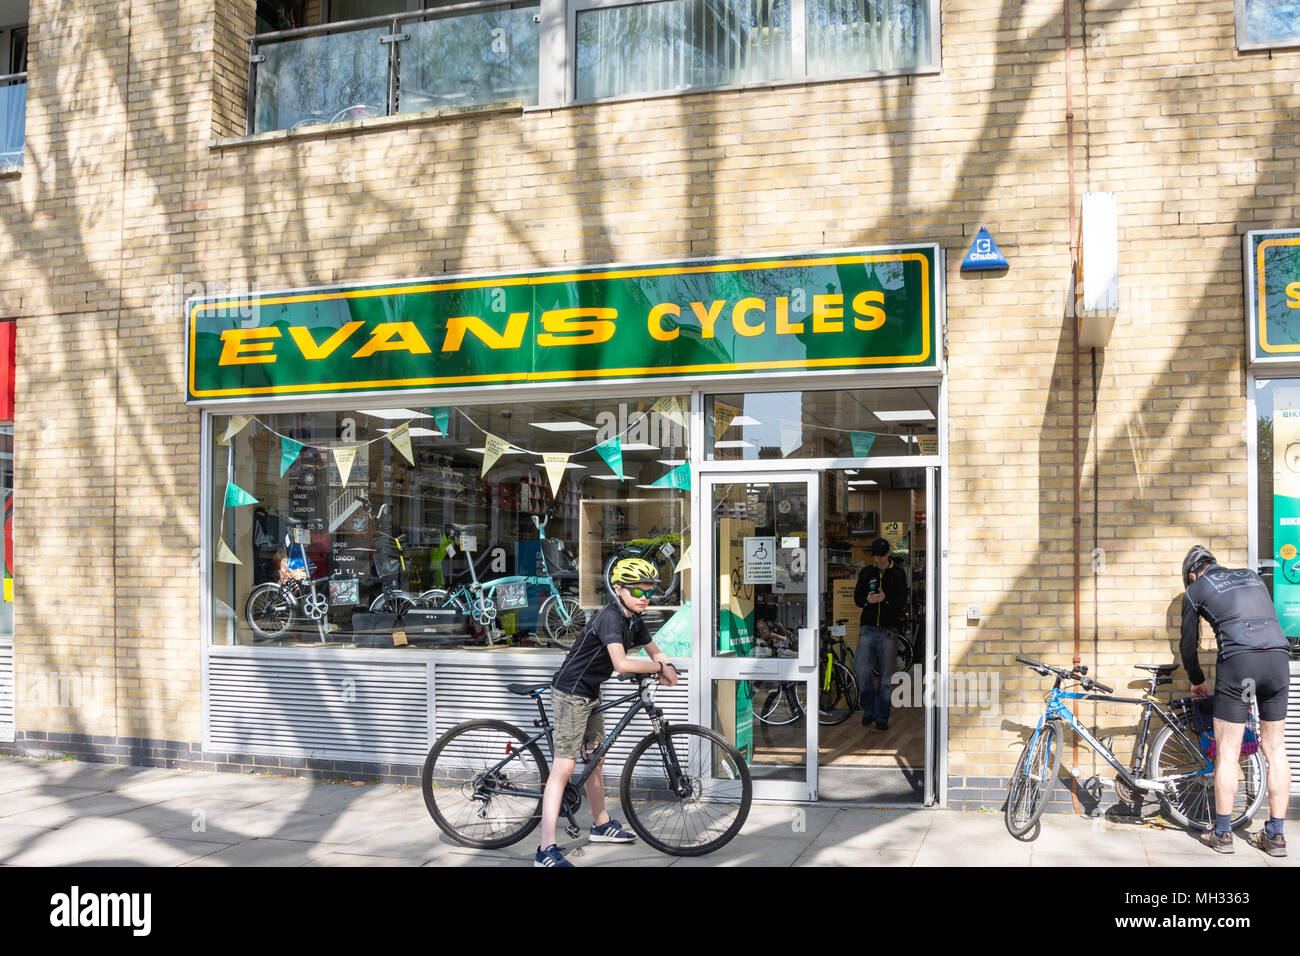 Tienda ciclos Evans, Chiswick High Street, Chiswick, Hounslow, London Borough of Greater London, England, Reino Unido Foto de stock